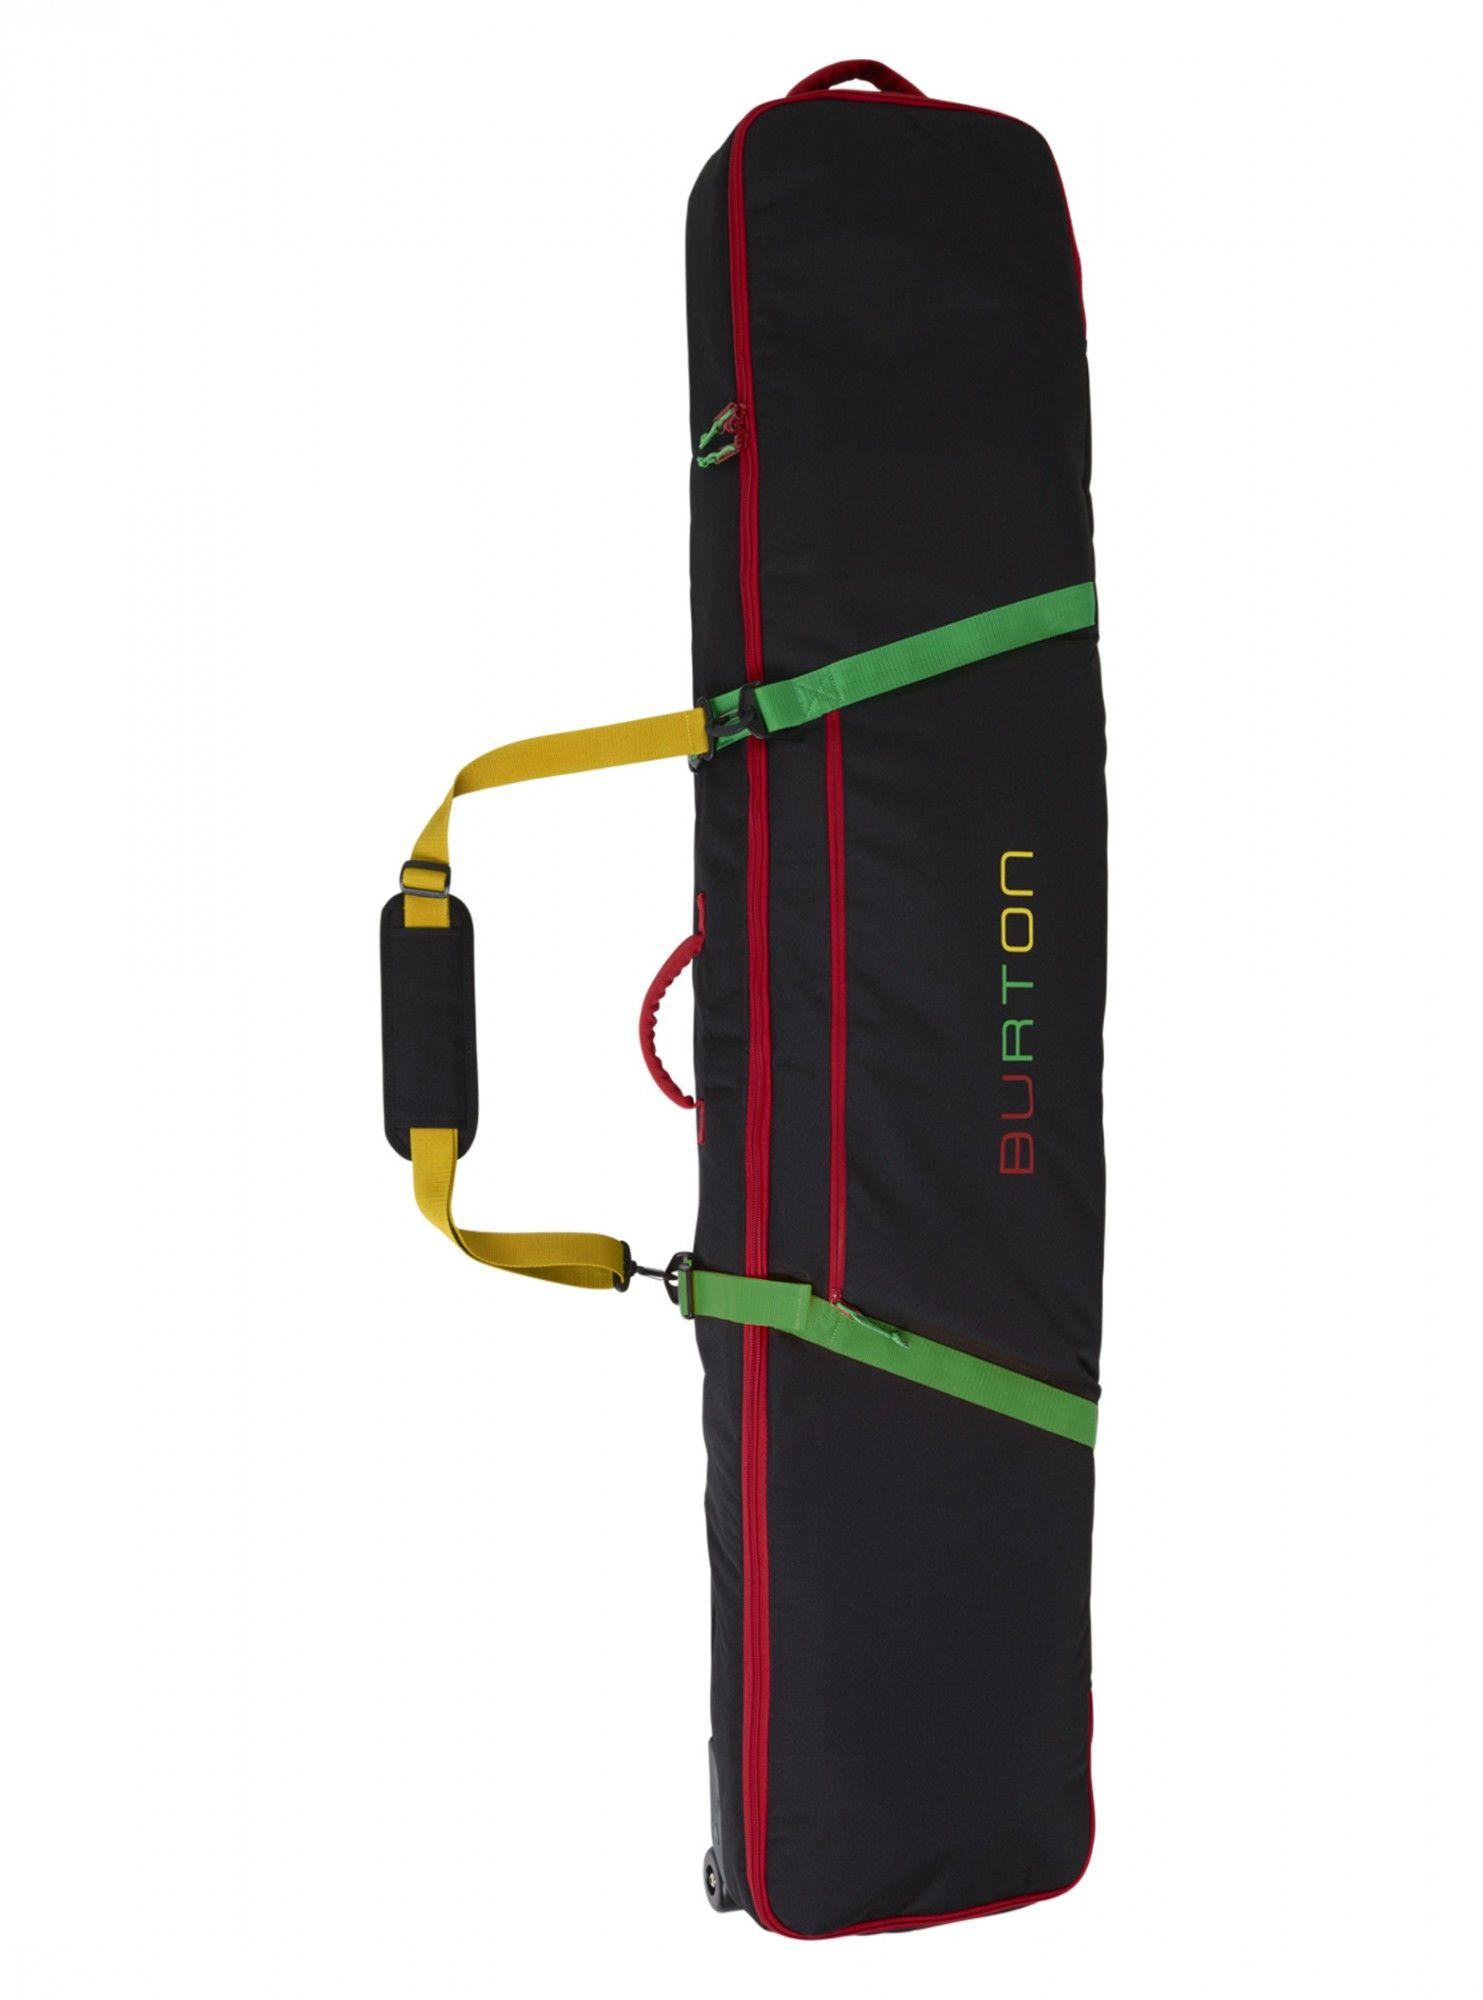 Burton Wheelie Gig Bag | Größe 146 cm,156 cm,166 cm,181 cm |  Ski- & Snowboard